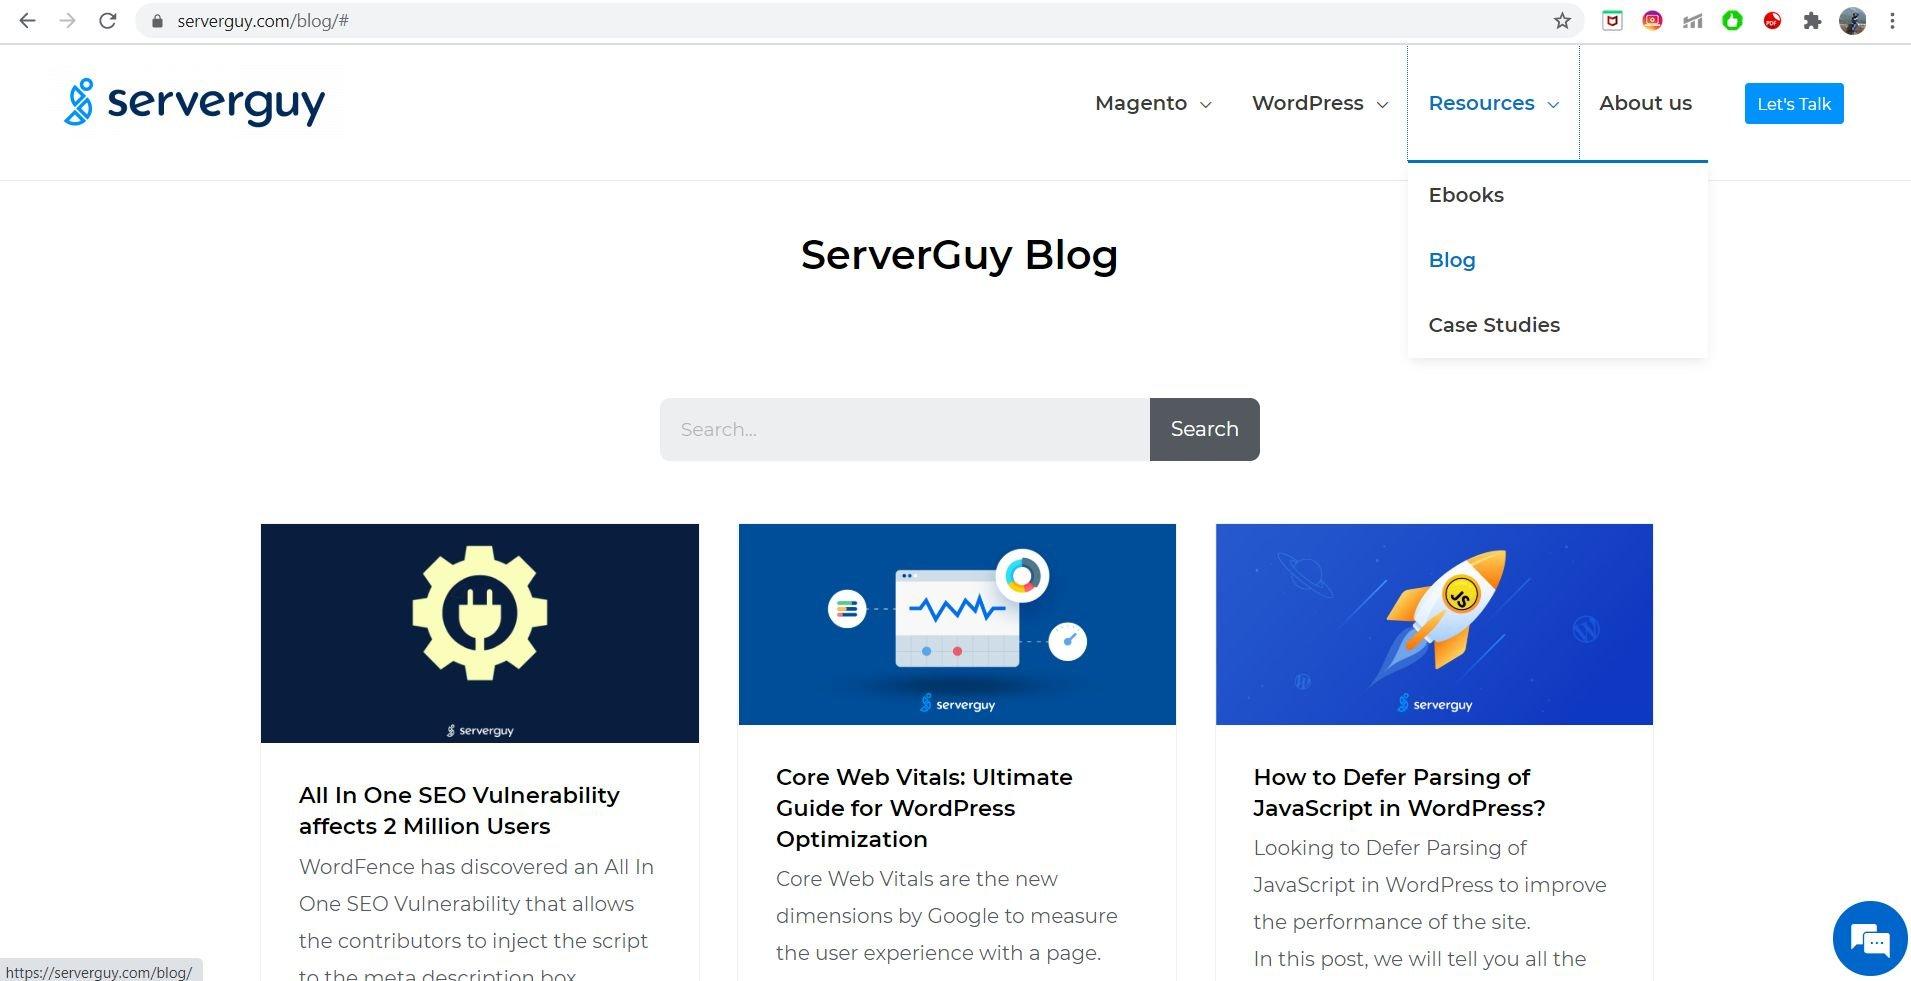 ServerGuy ease of use